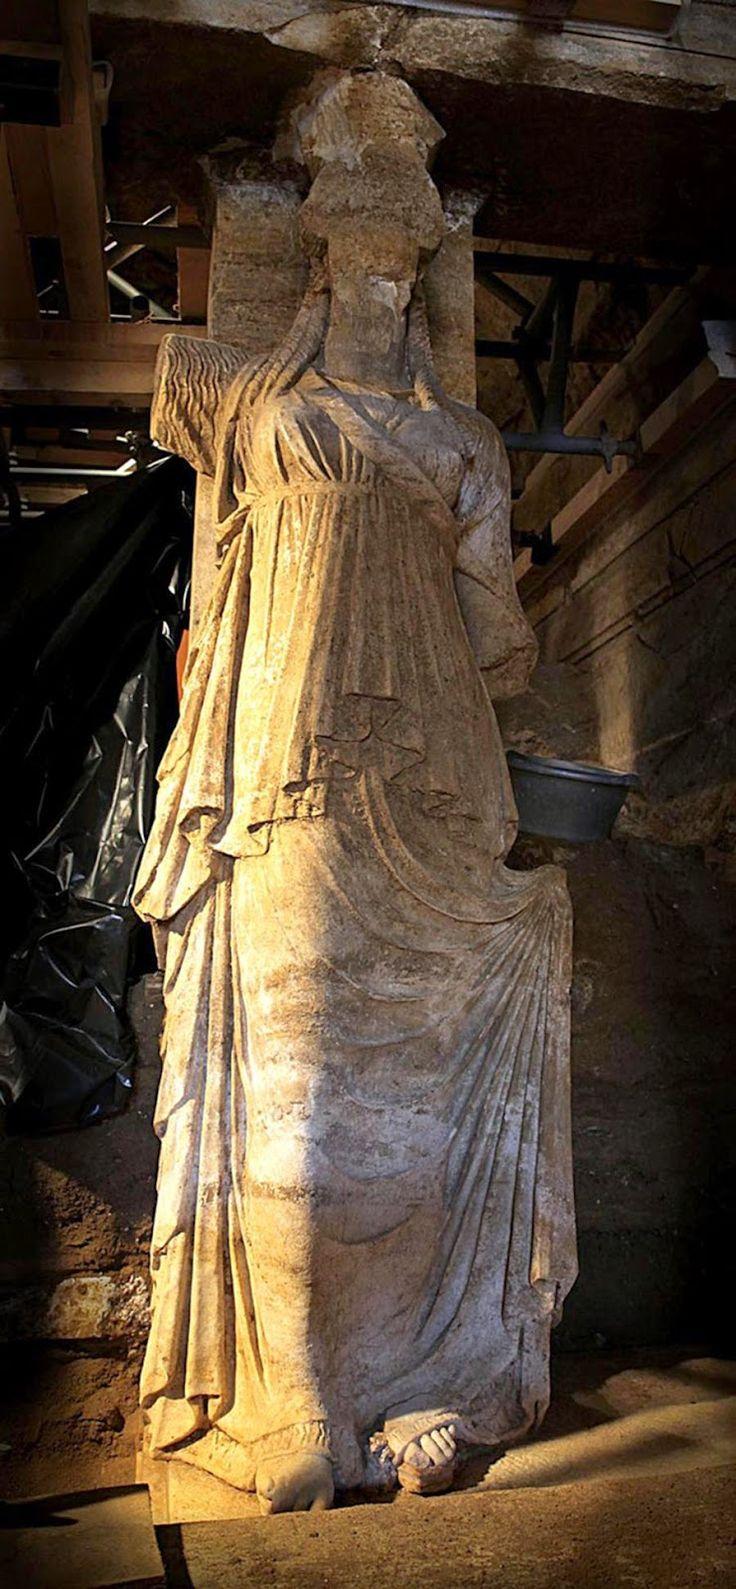 explore nature: Ολόκληρες οι Καρυάτιδες στην ανασκαφή της Αμφίπολης (ΦΩΤΟ)